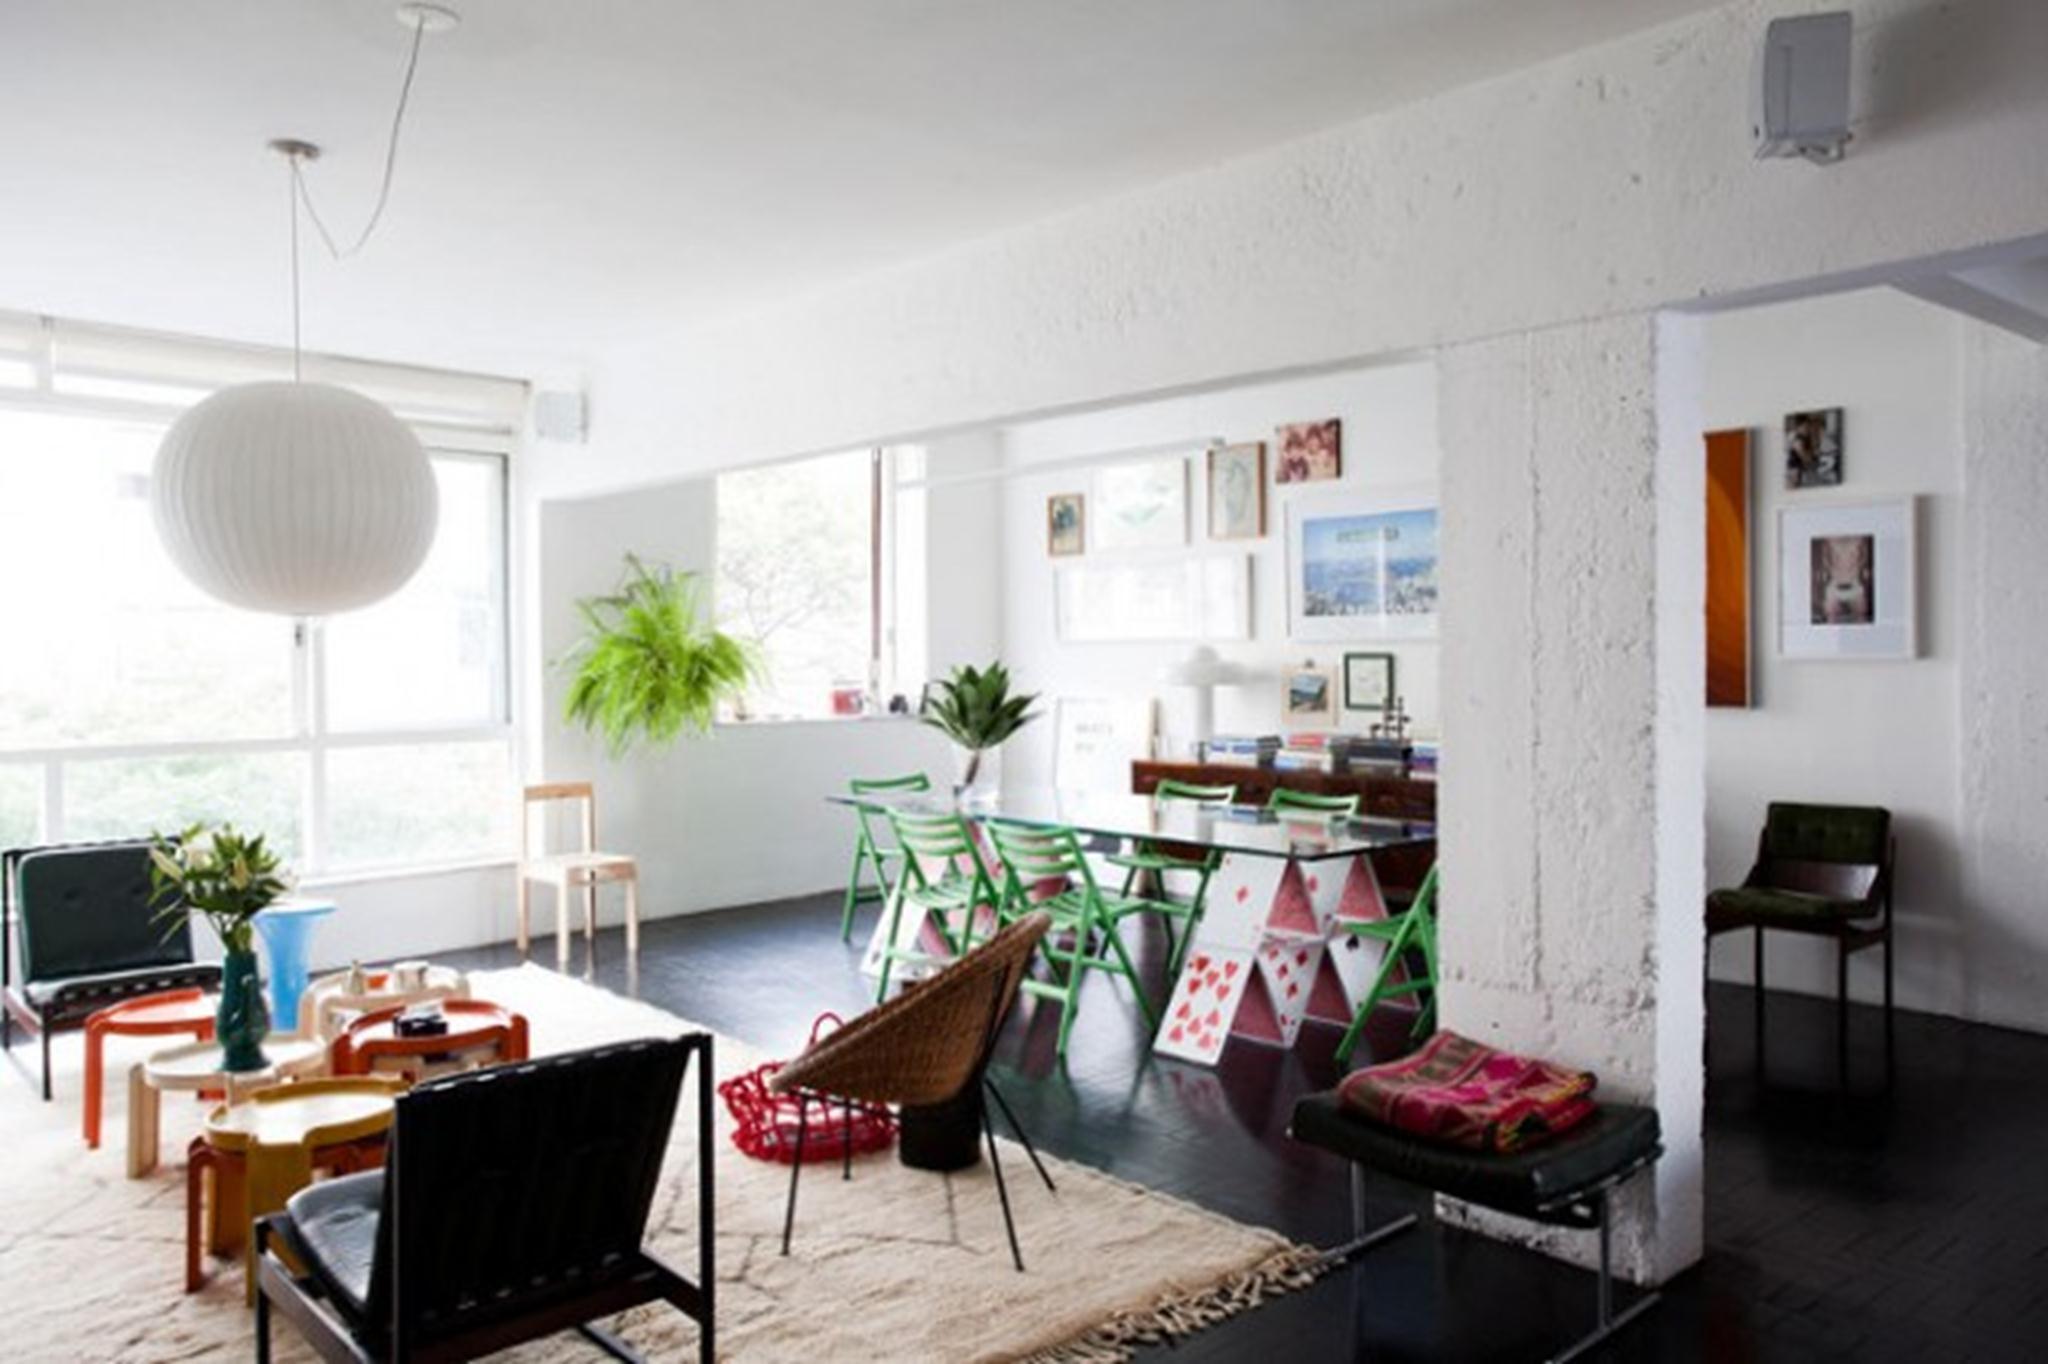 architects-apartment0 (Copy)